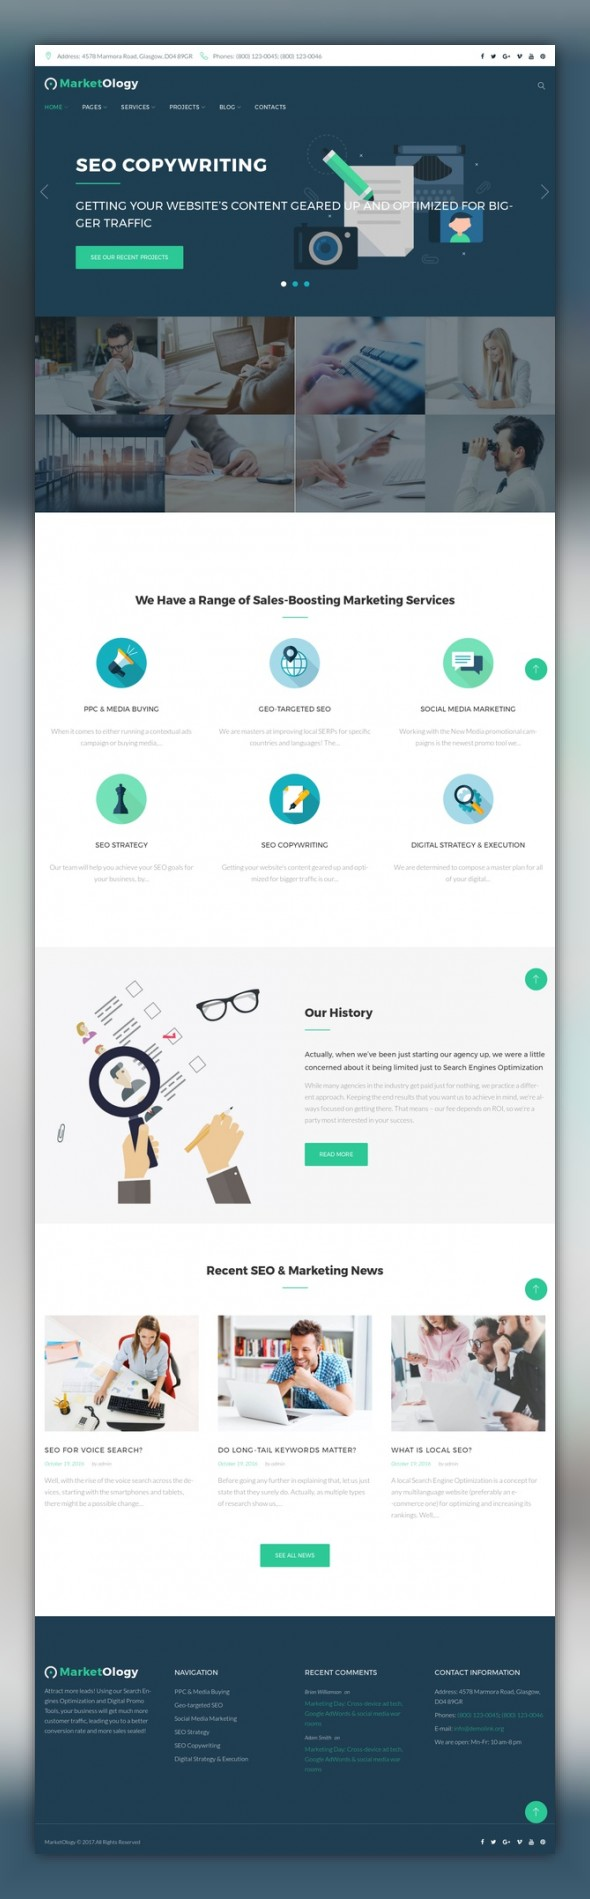 MarketOlogy - SEO and Marketing Agency Responsive WordPress Theme ...